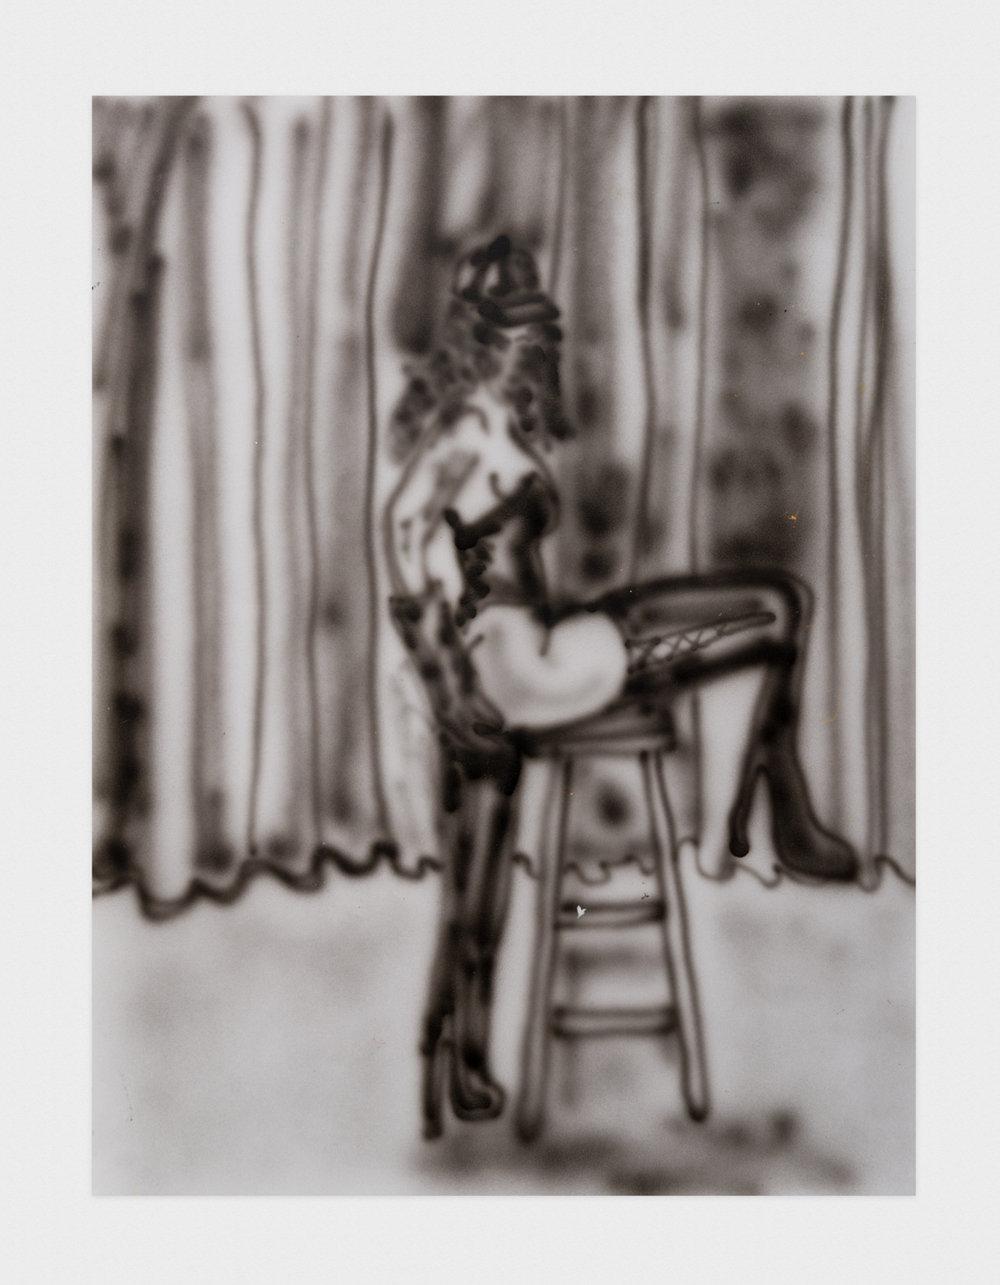 Alex Becerra Open 24/7 Girls 2016 Airbrush on paper 24 x 18 in (60.96h x 45.72w cm) AB136